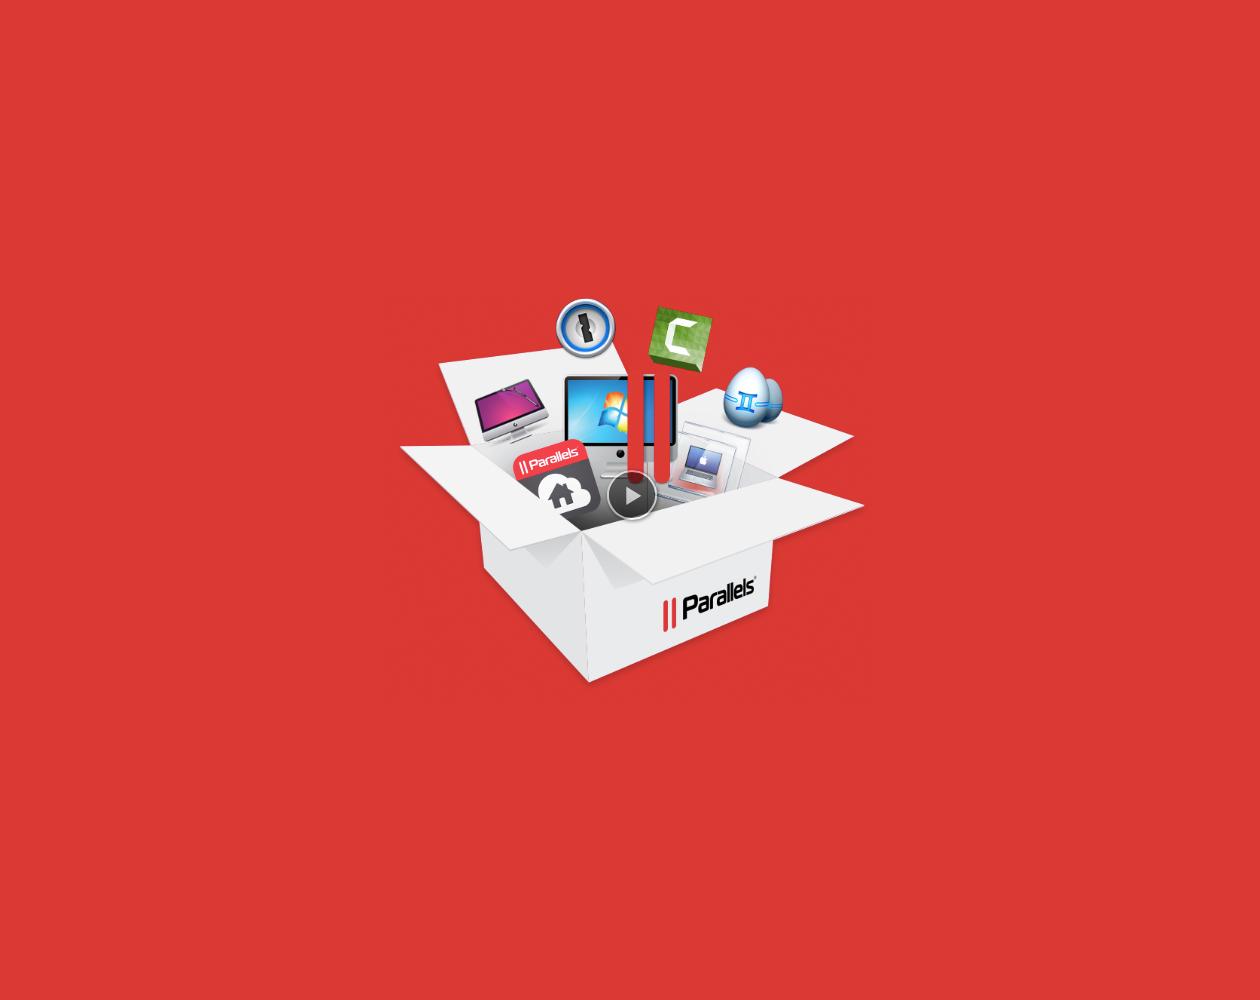 Parallels раздаёт CleanMyMac 2, 1Password и другие приложения в отличном бандле